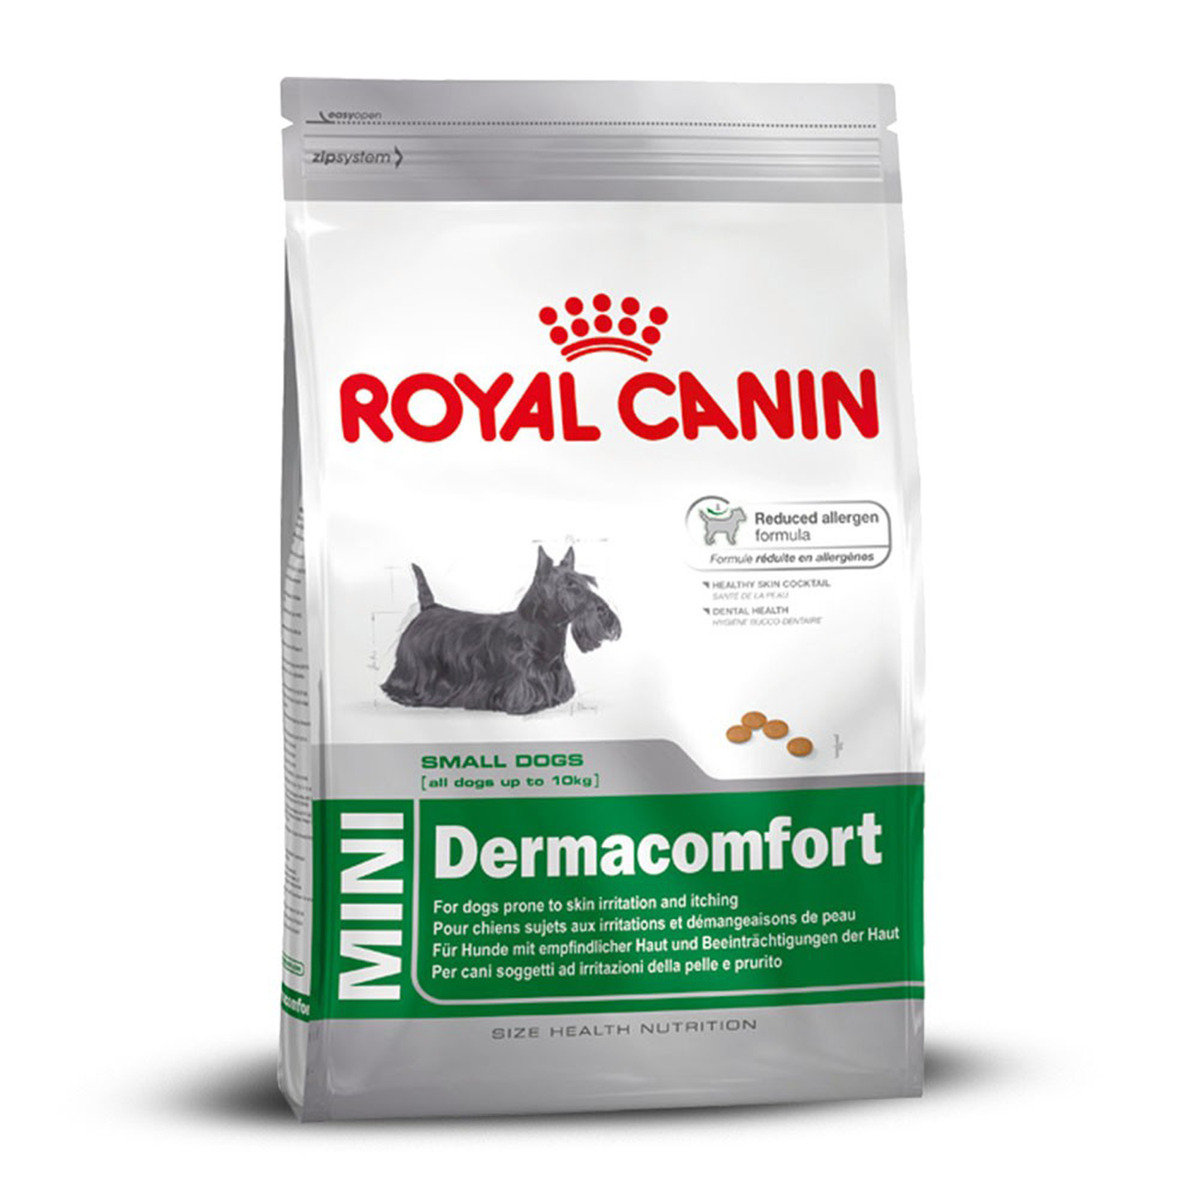 Mini Dermacomfort 26 皮膚敏感專用配方 (DCMI)